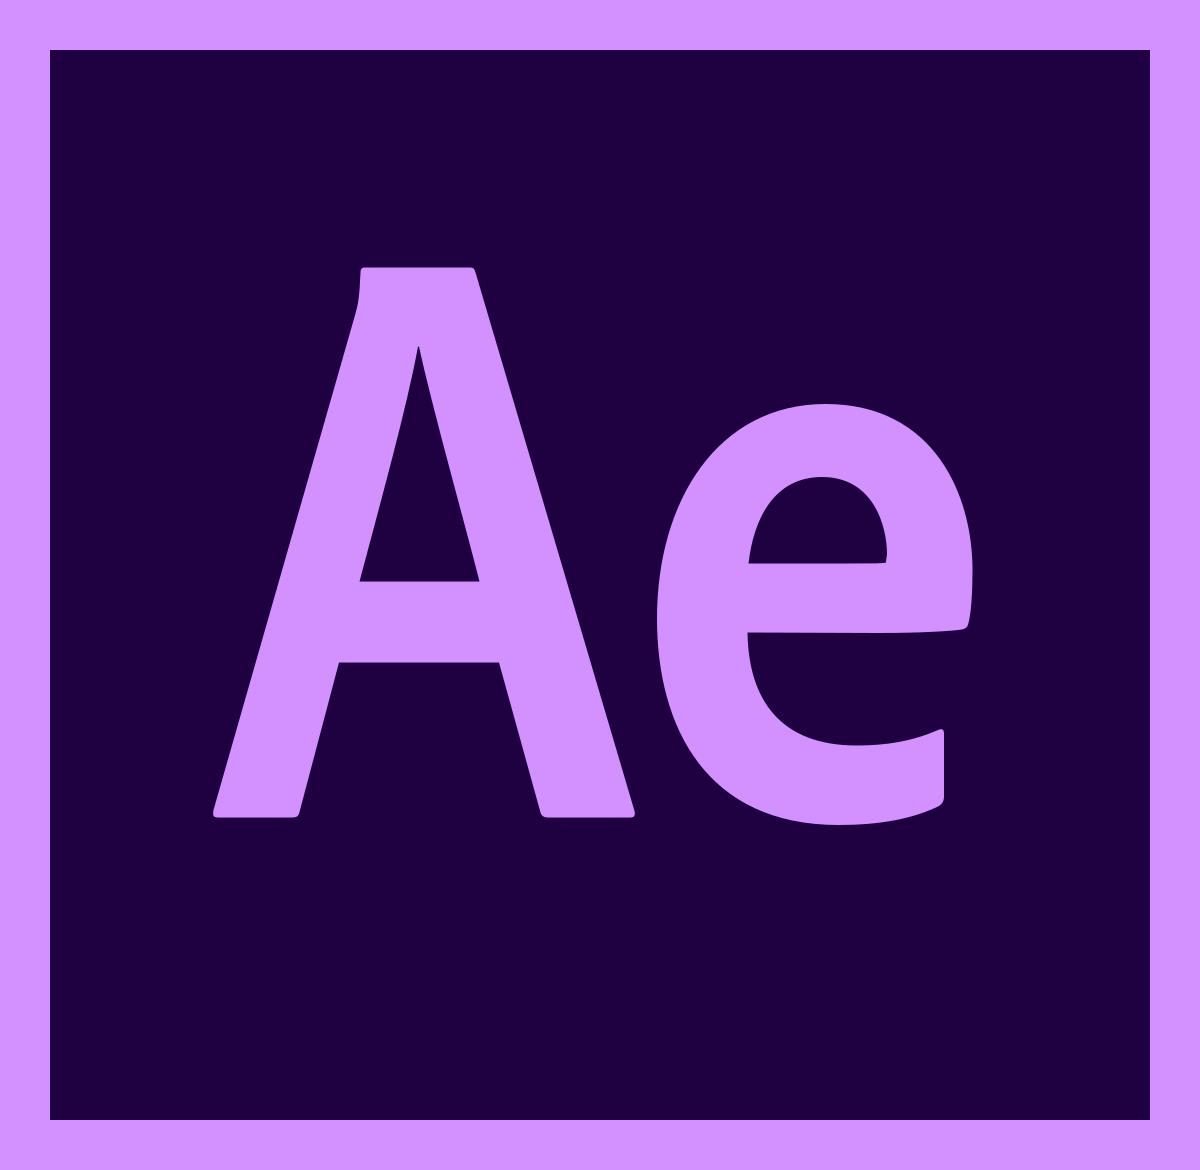 Adobe cc 2017 full crack